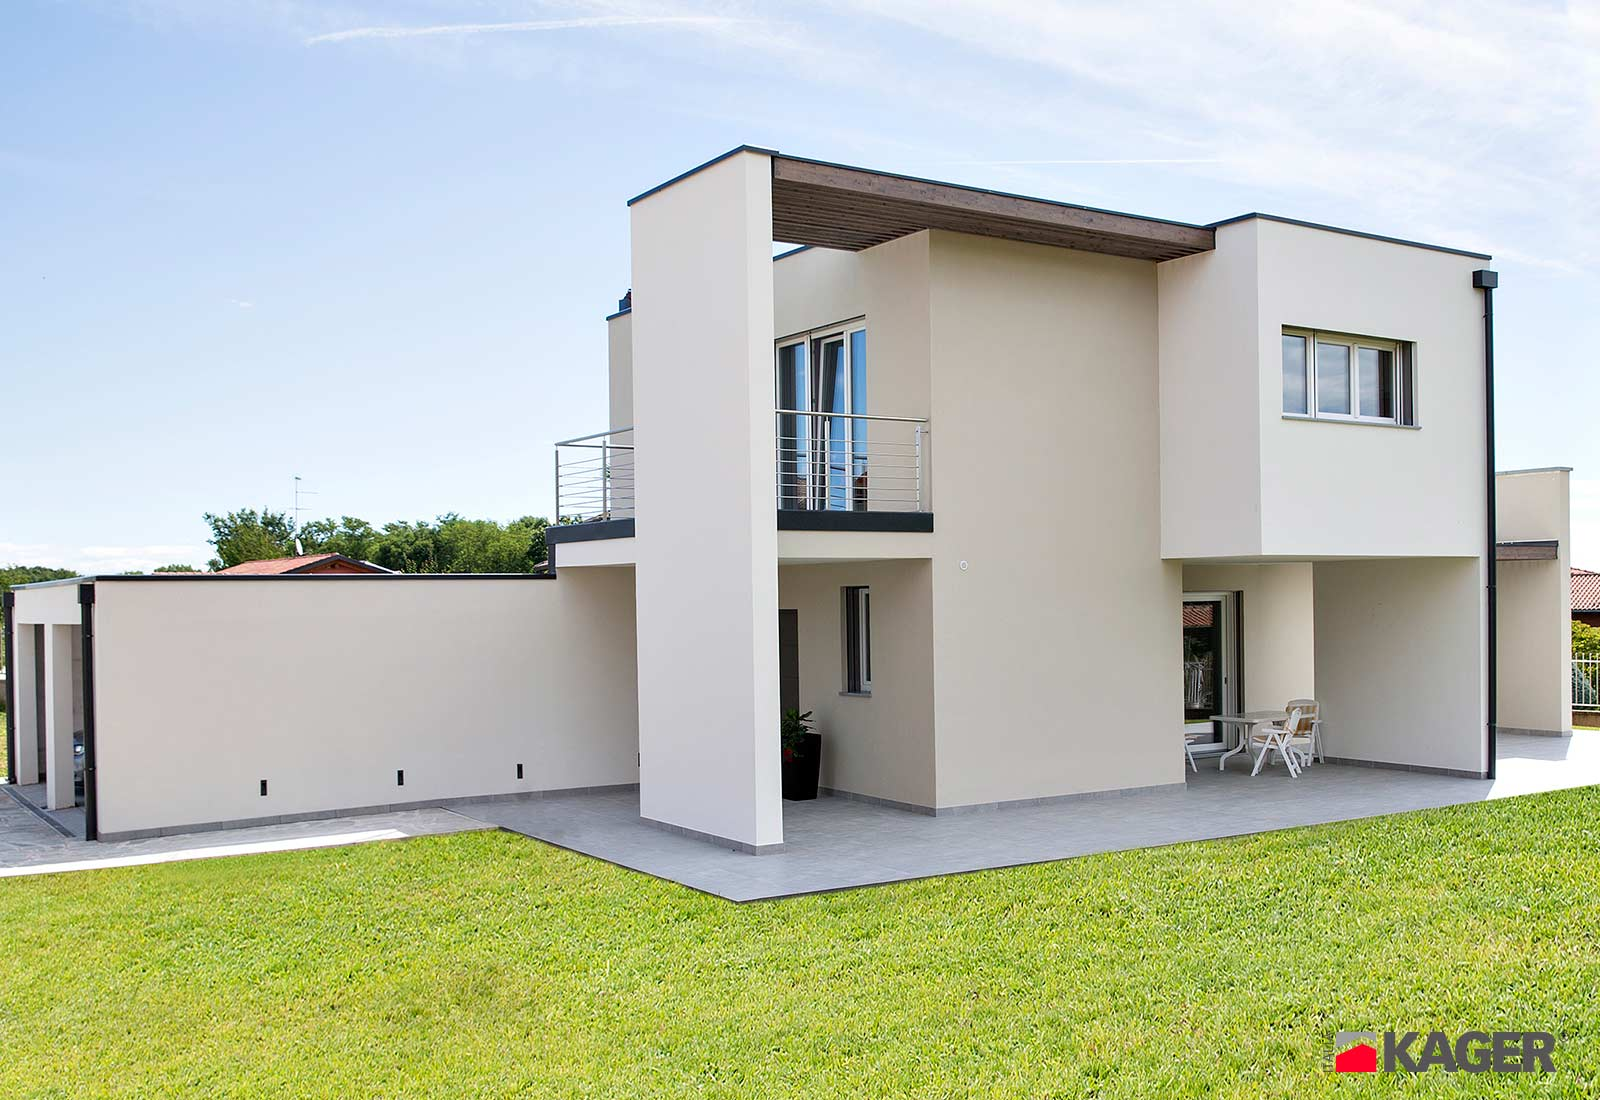 Casa-in-legno-Boca-Novara-Kager-Italia-03